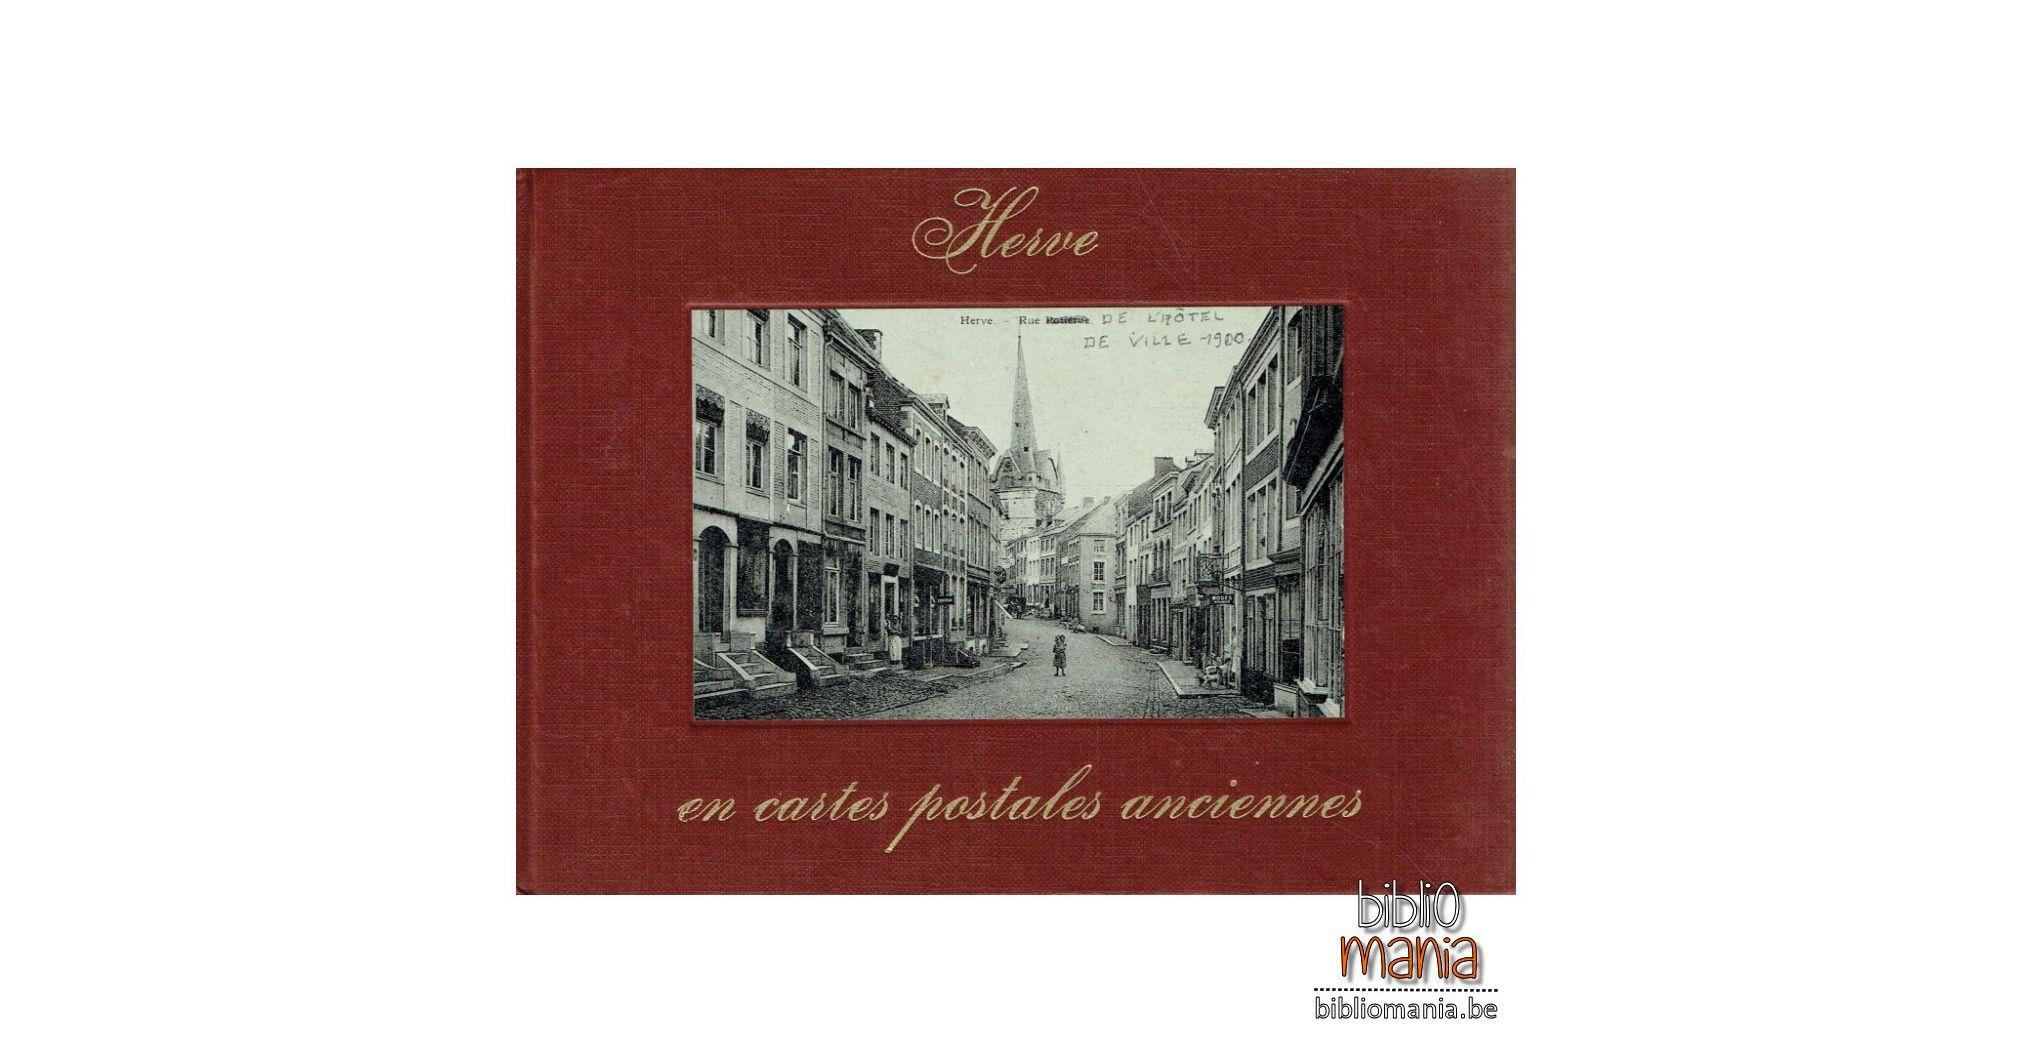 Herve en cartes postales anciennes (Jules Saive) | Bibliomania